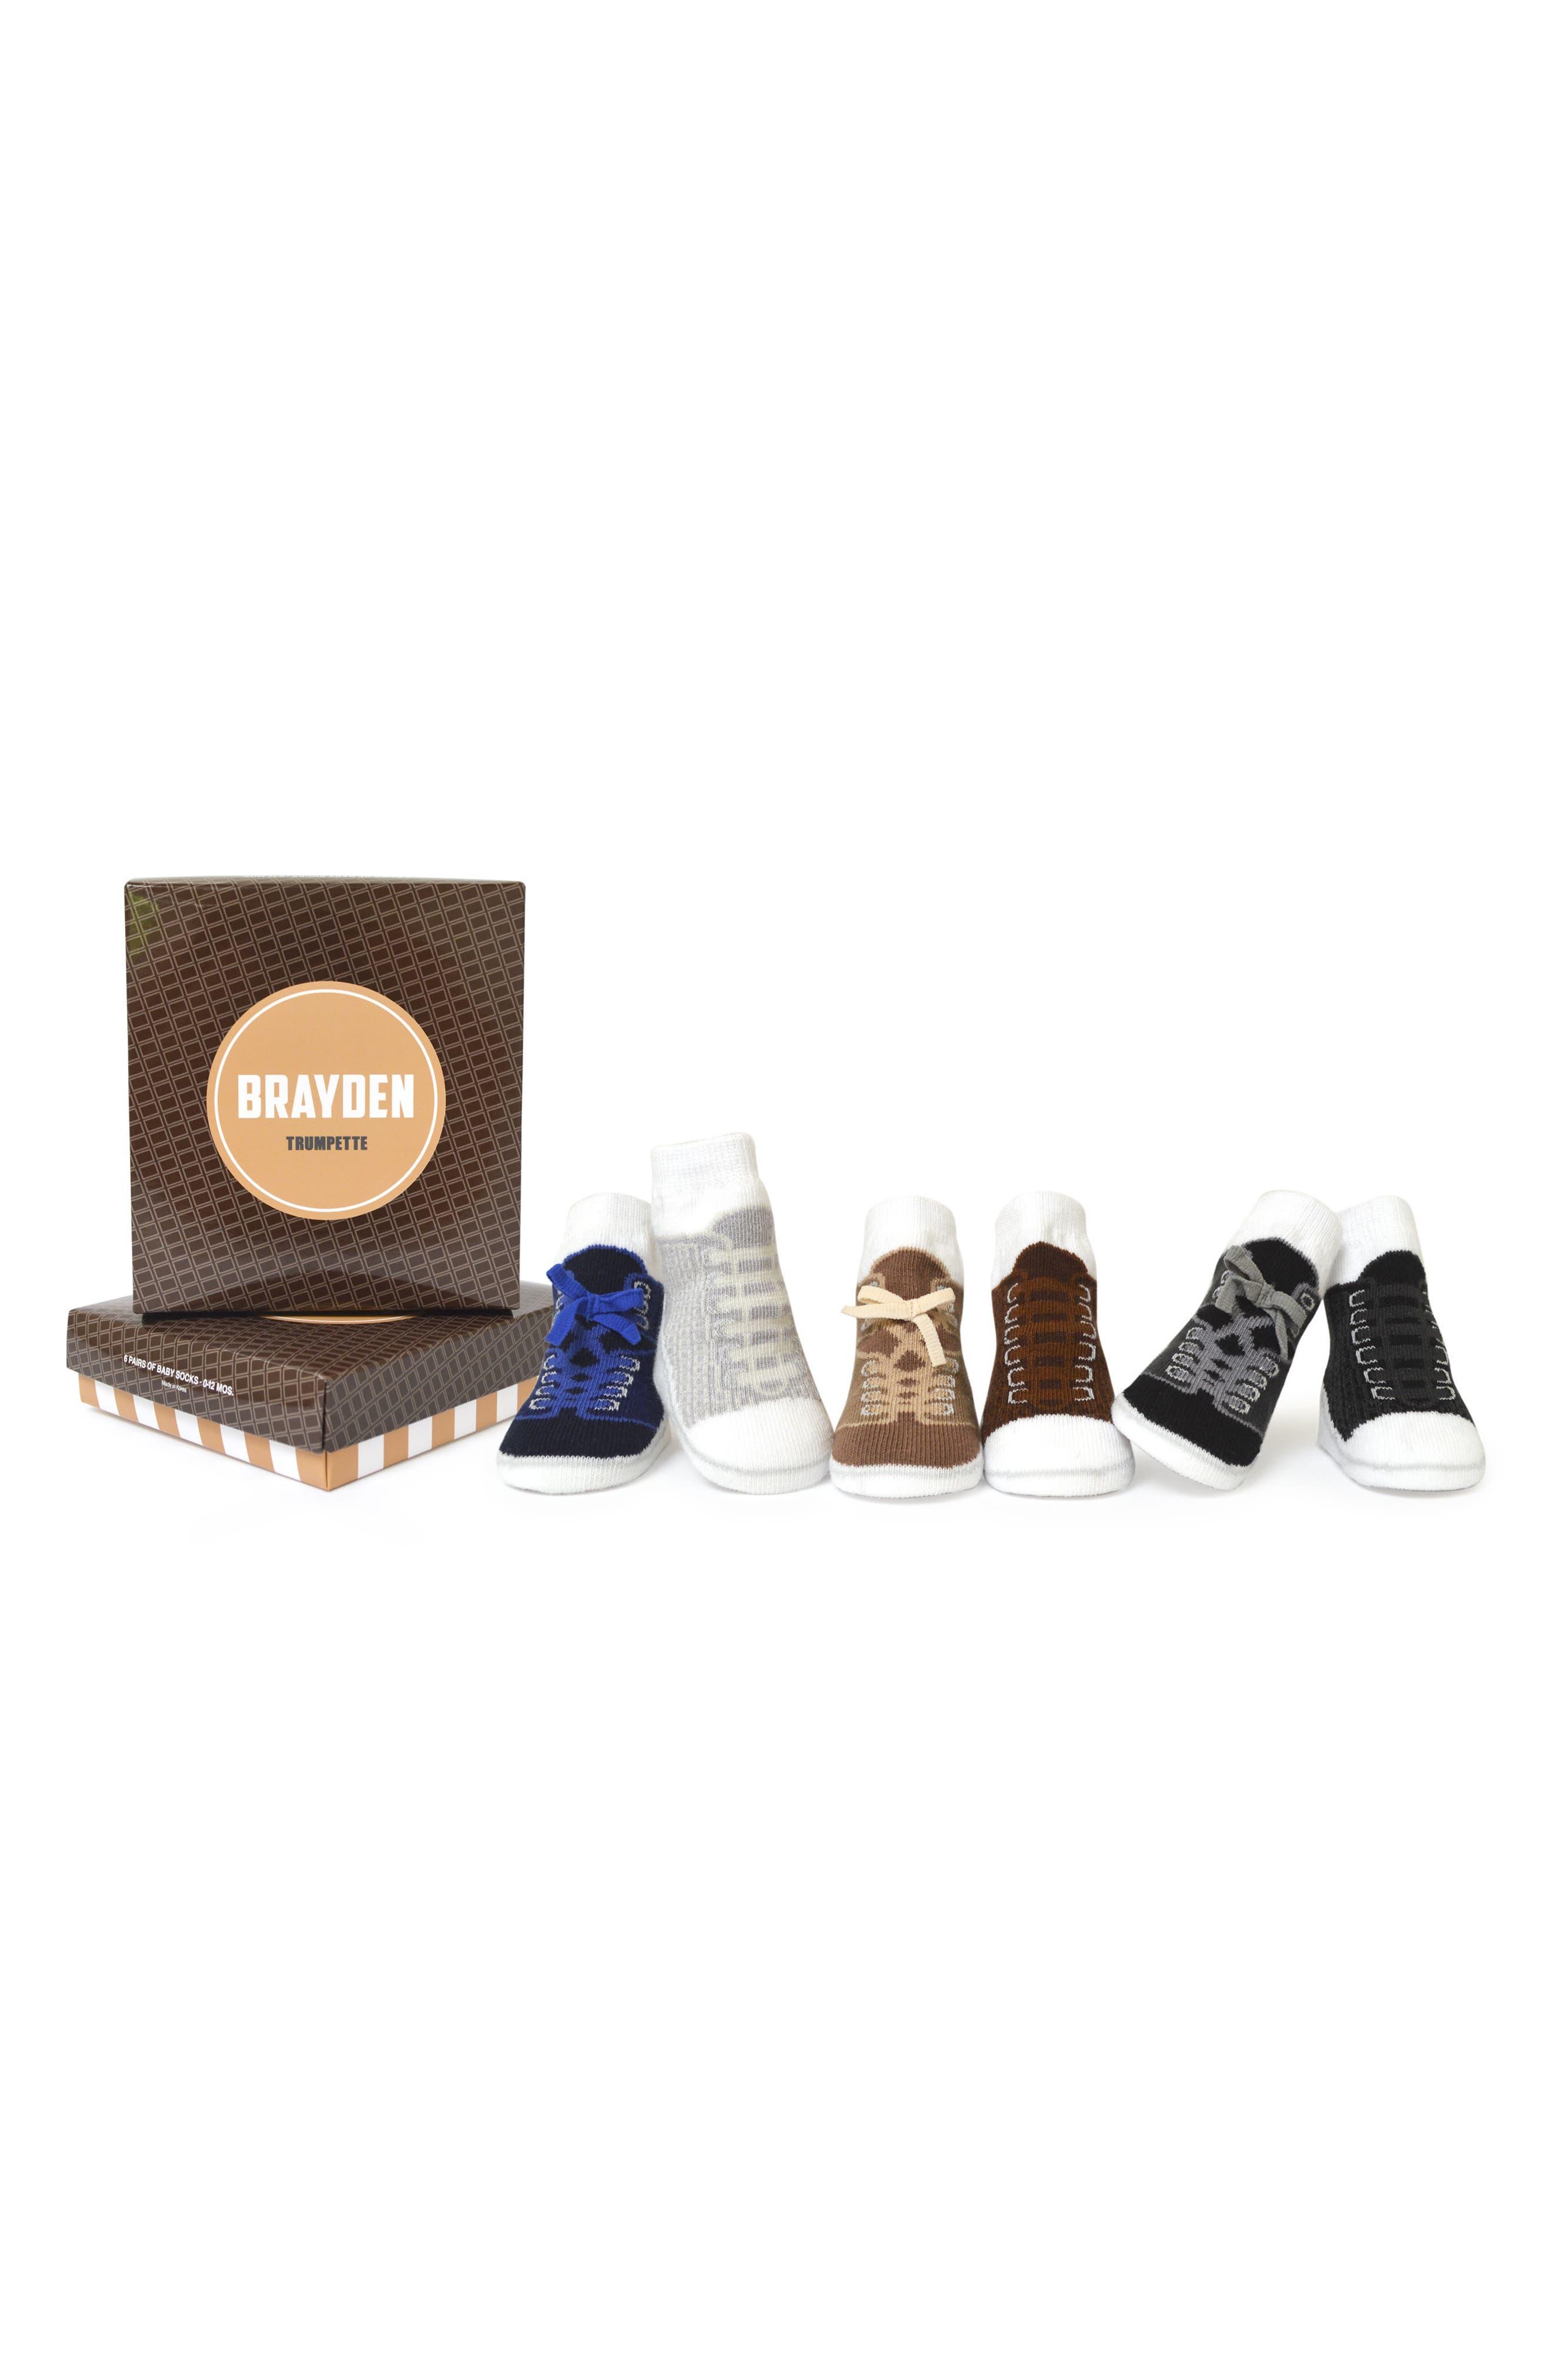 Brayden 6-Pack Socks,                         Main,                         color,